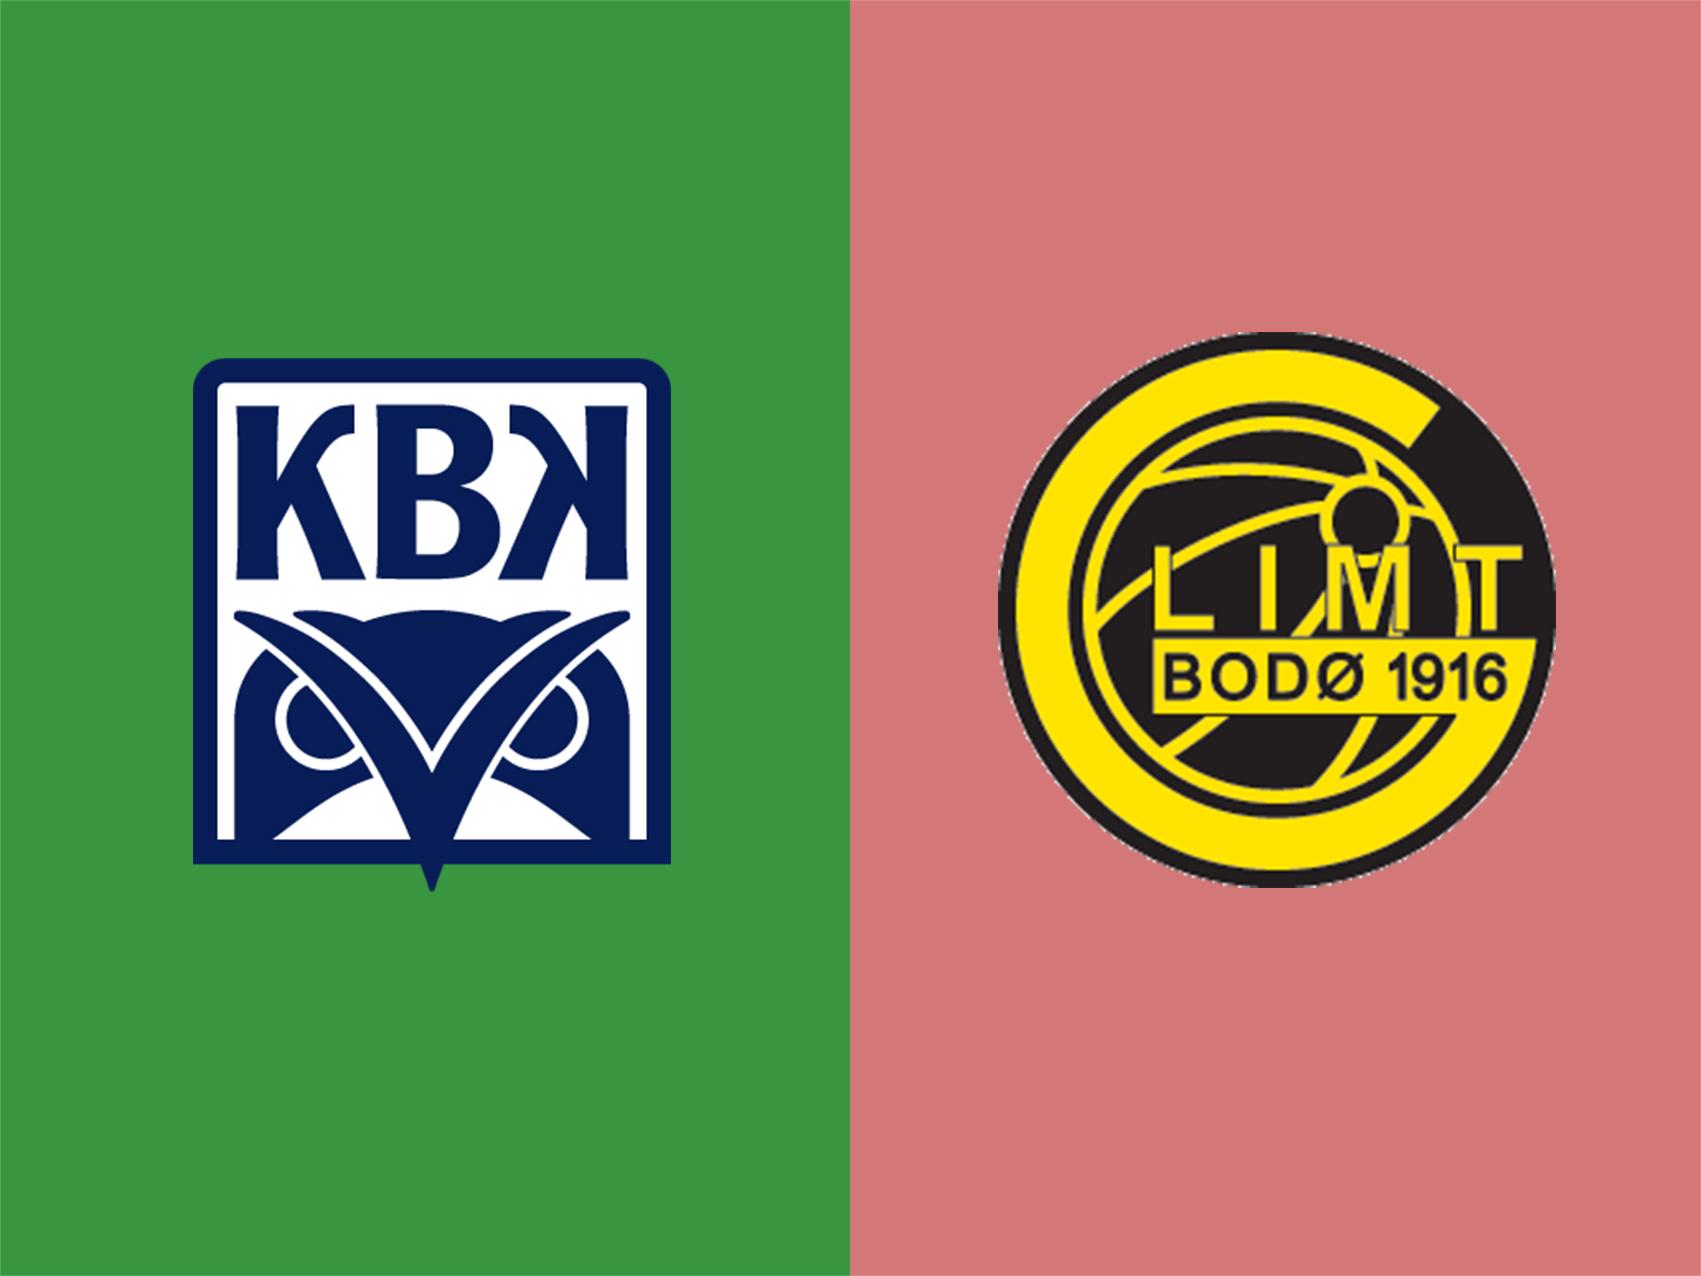 soi-keo-ca-cuoc-bong-da-ngay-12-5-West Brom-vs-Aston Villa-khong-nhieu-hy-vong-b9 1